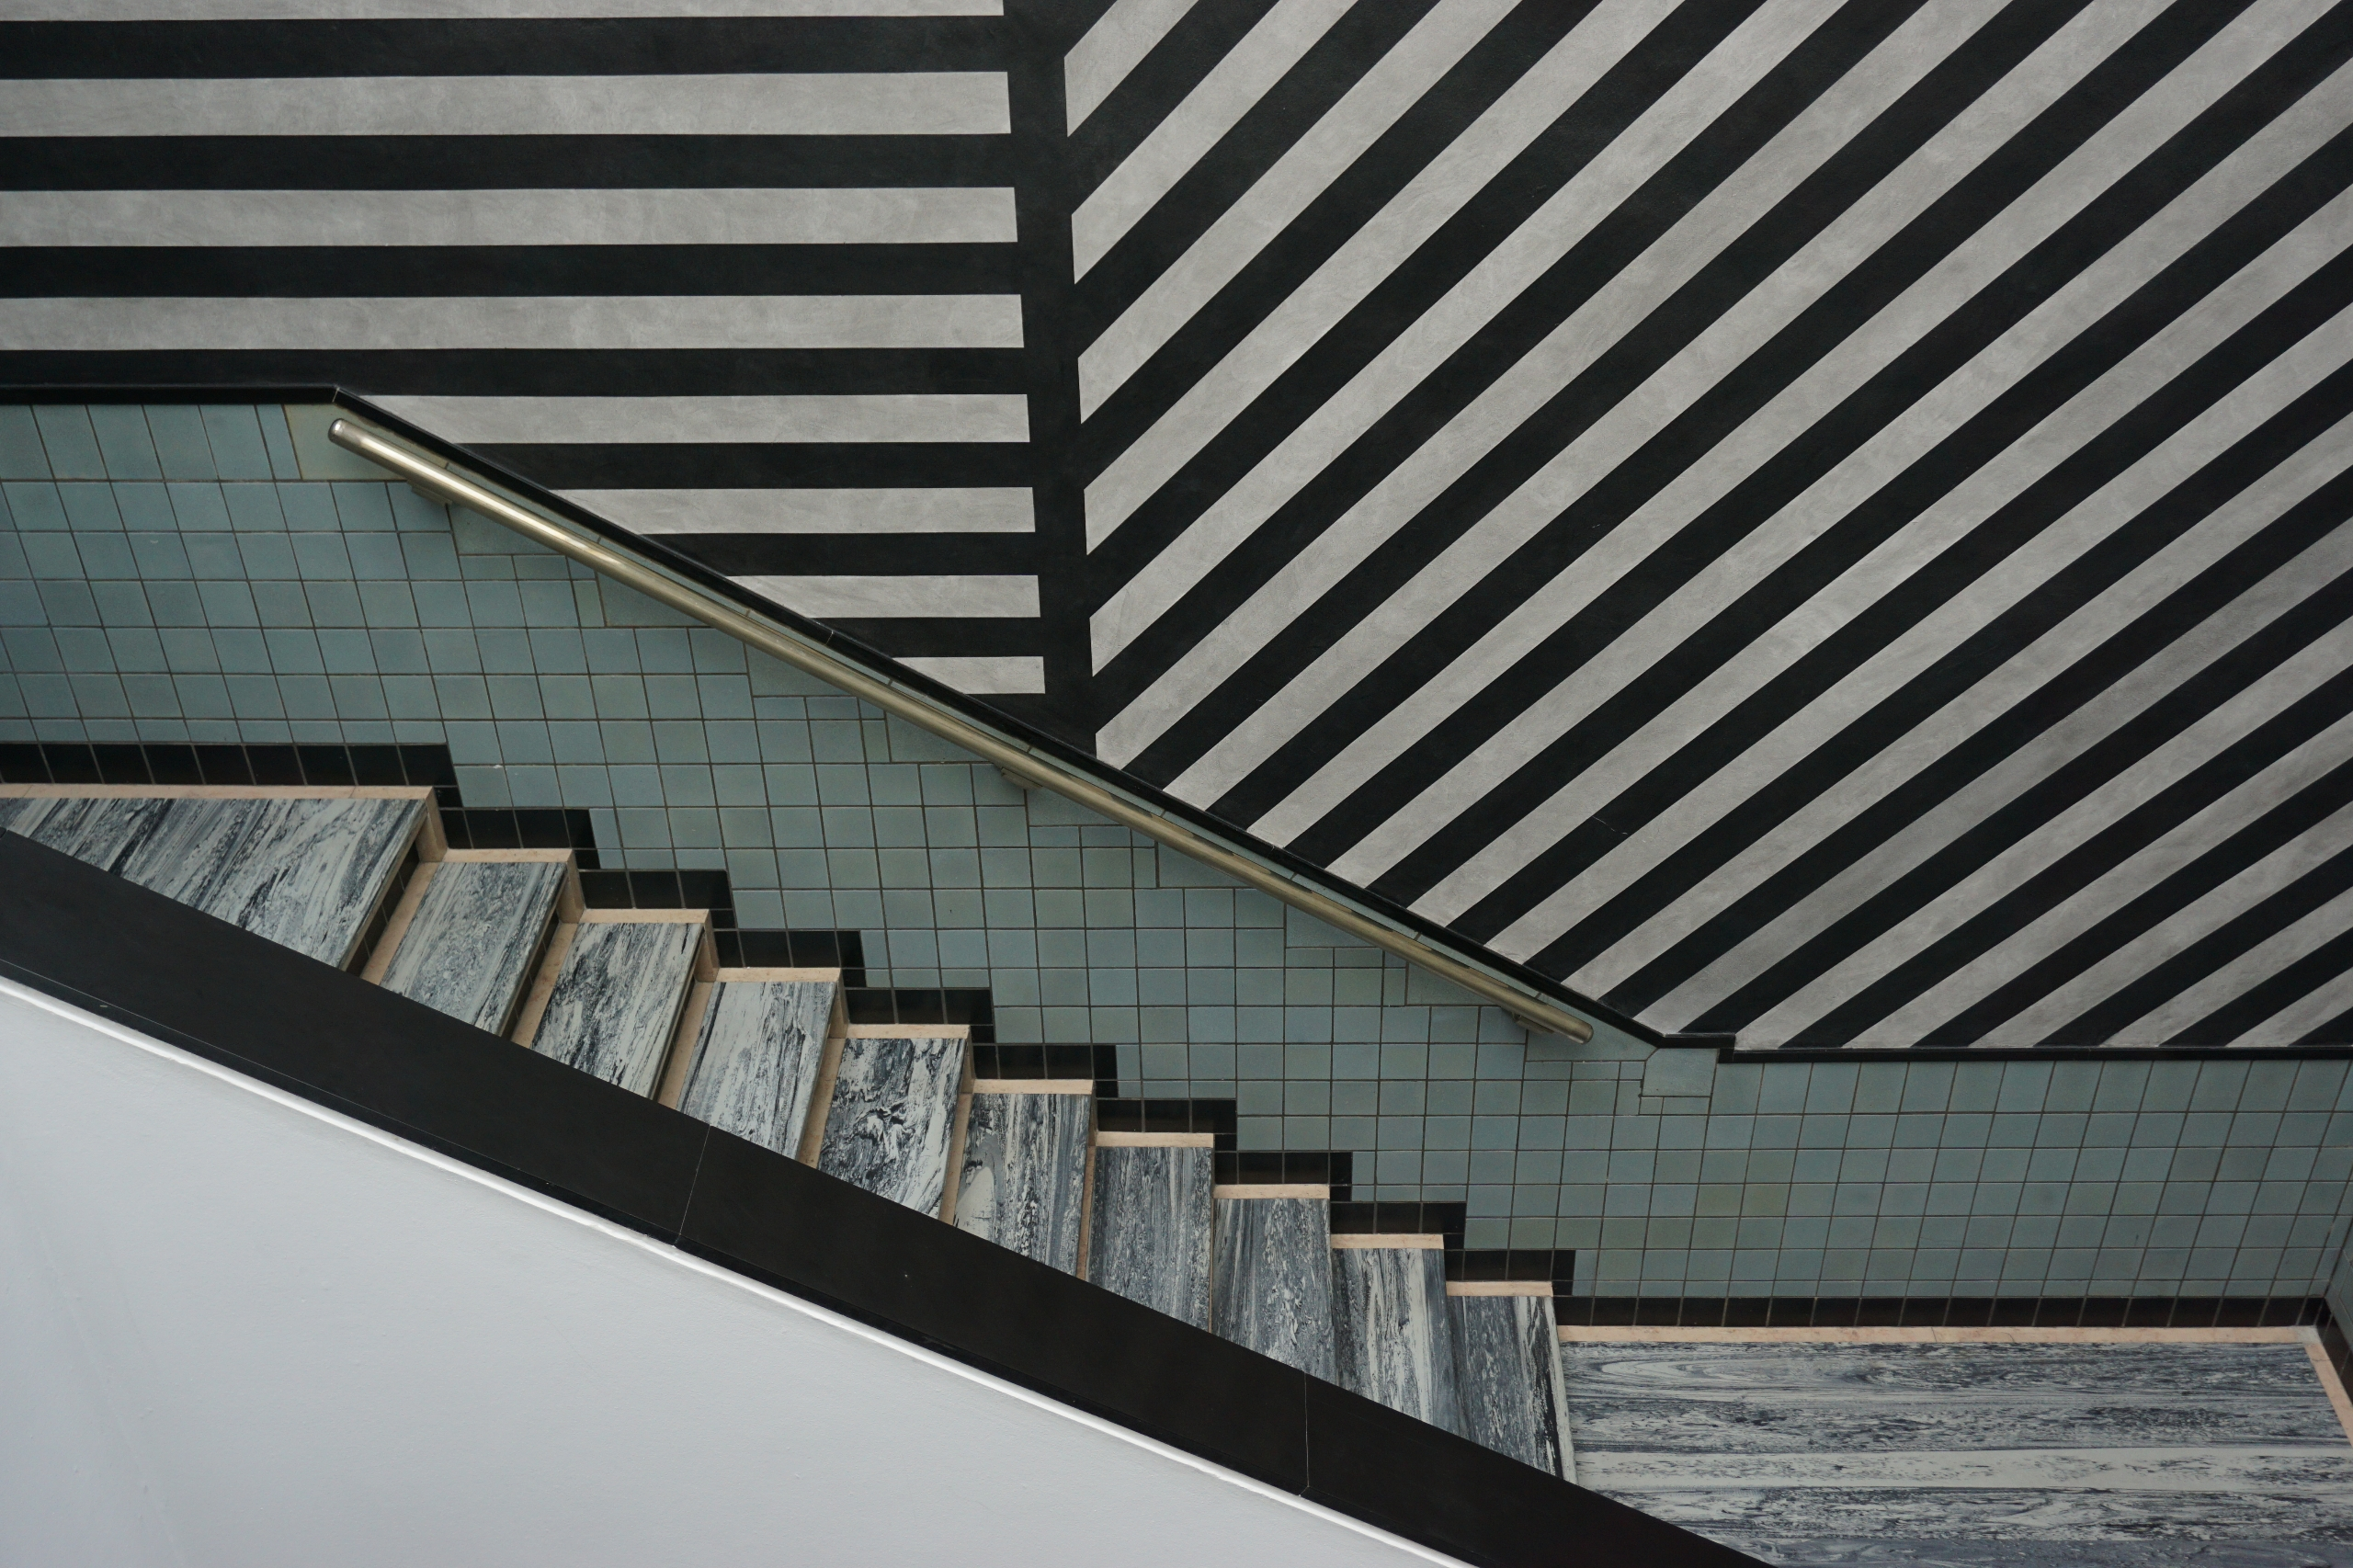 Gemeentemuseum Den Haag - Trapp - bartvancoillie | ello